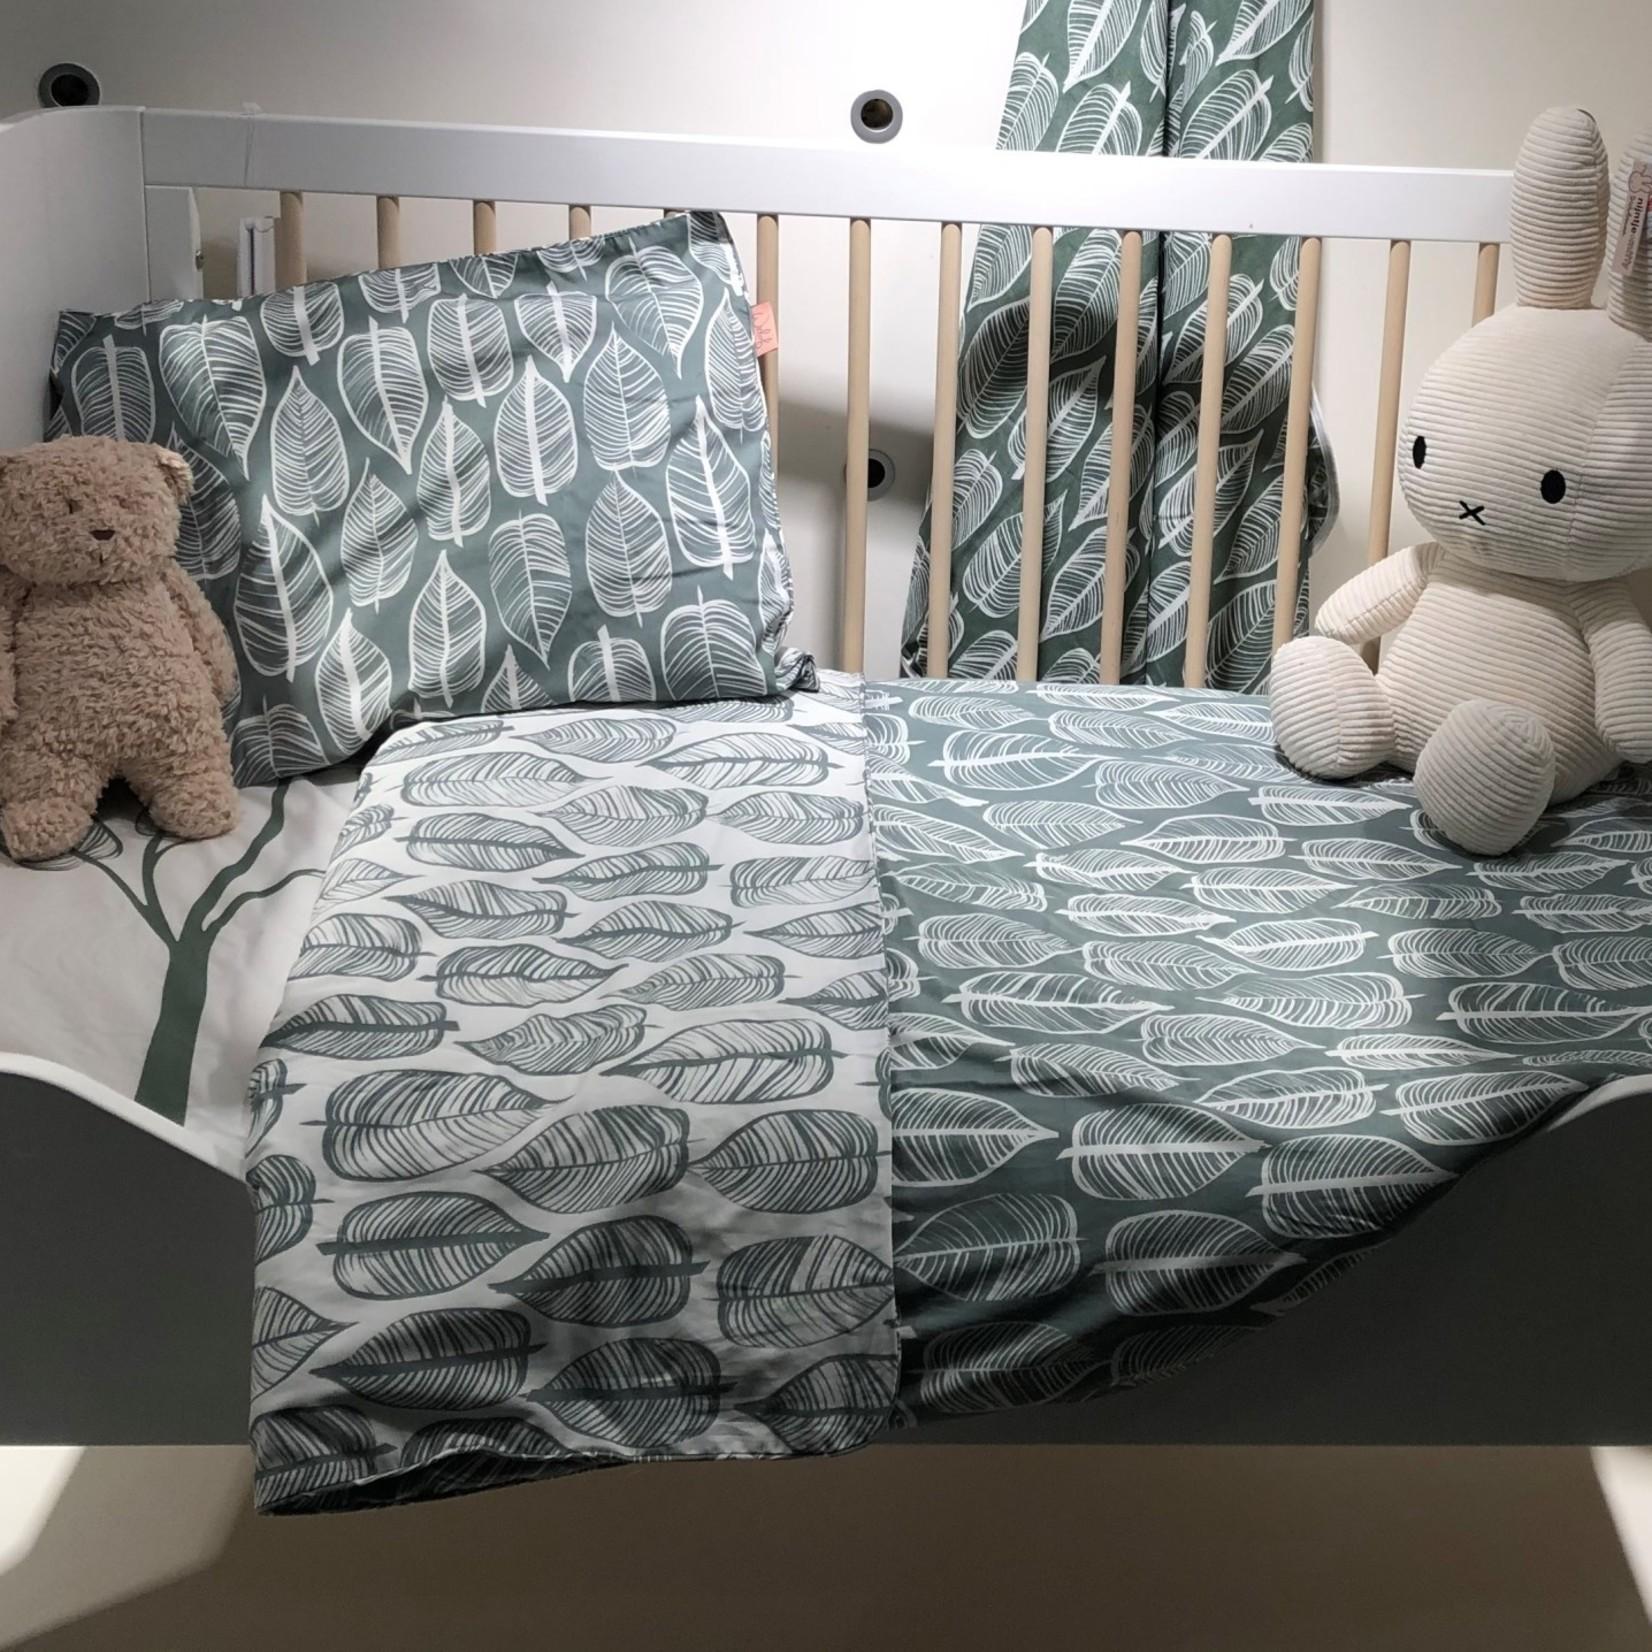 Troll Toddler kant voor bed wit-natuur